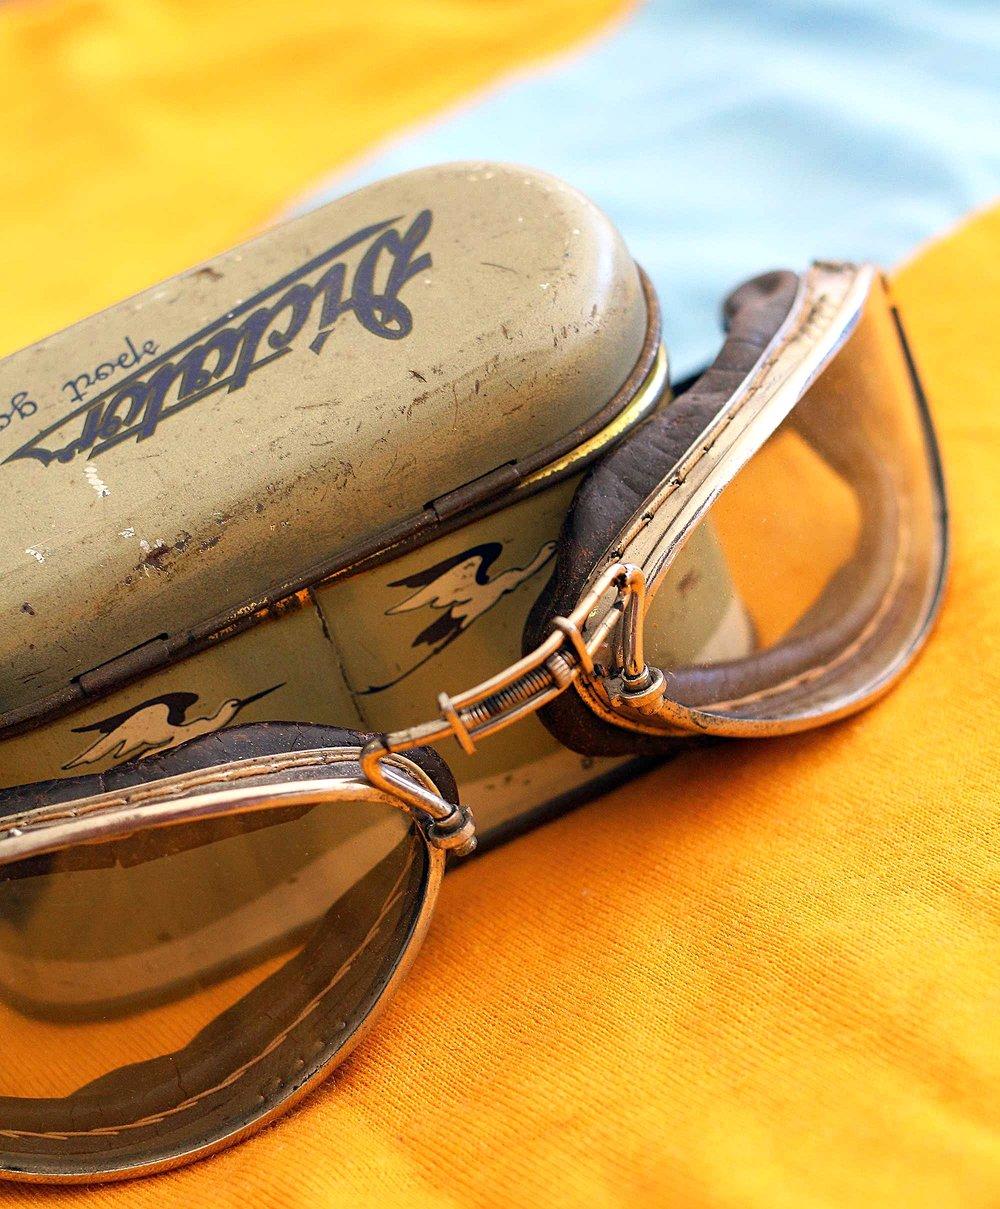 ron-miriello-grafico-san-diego-officina-eroica-vintage-cycling-jersey-memorabilia-maglia-bici-branding-07.jpg